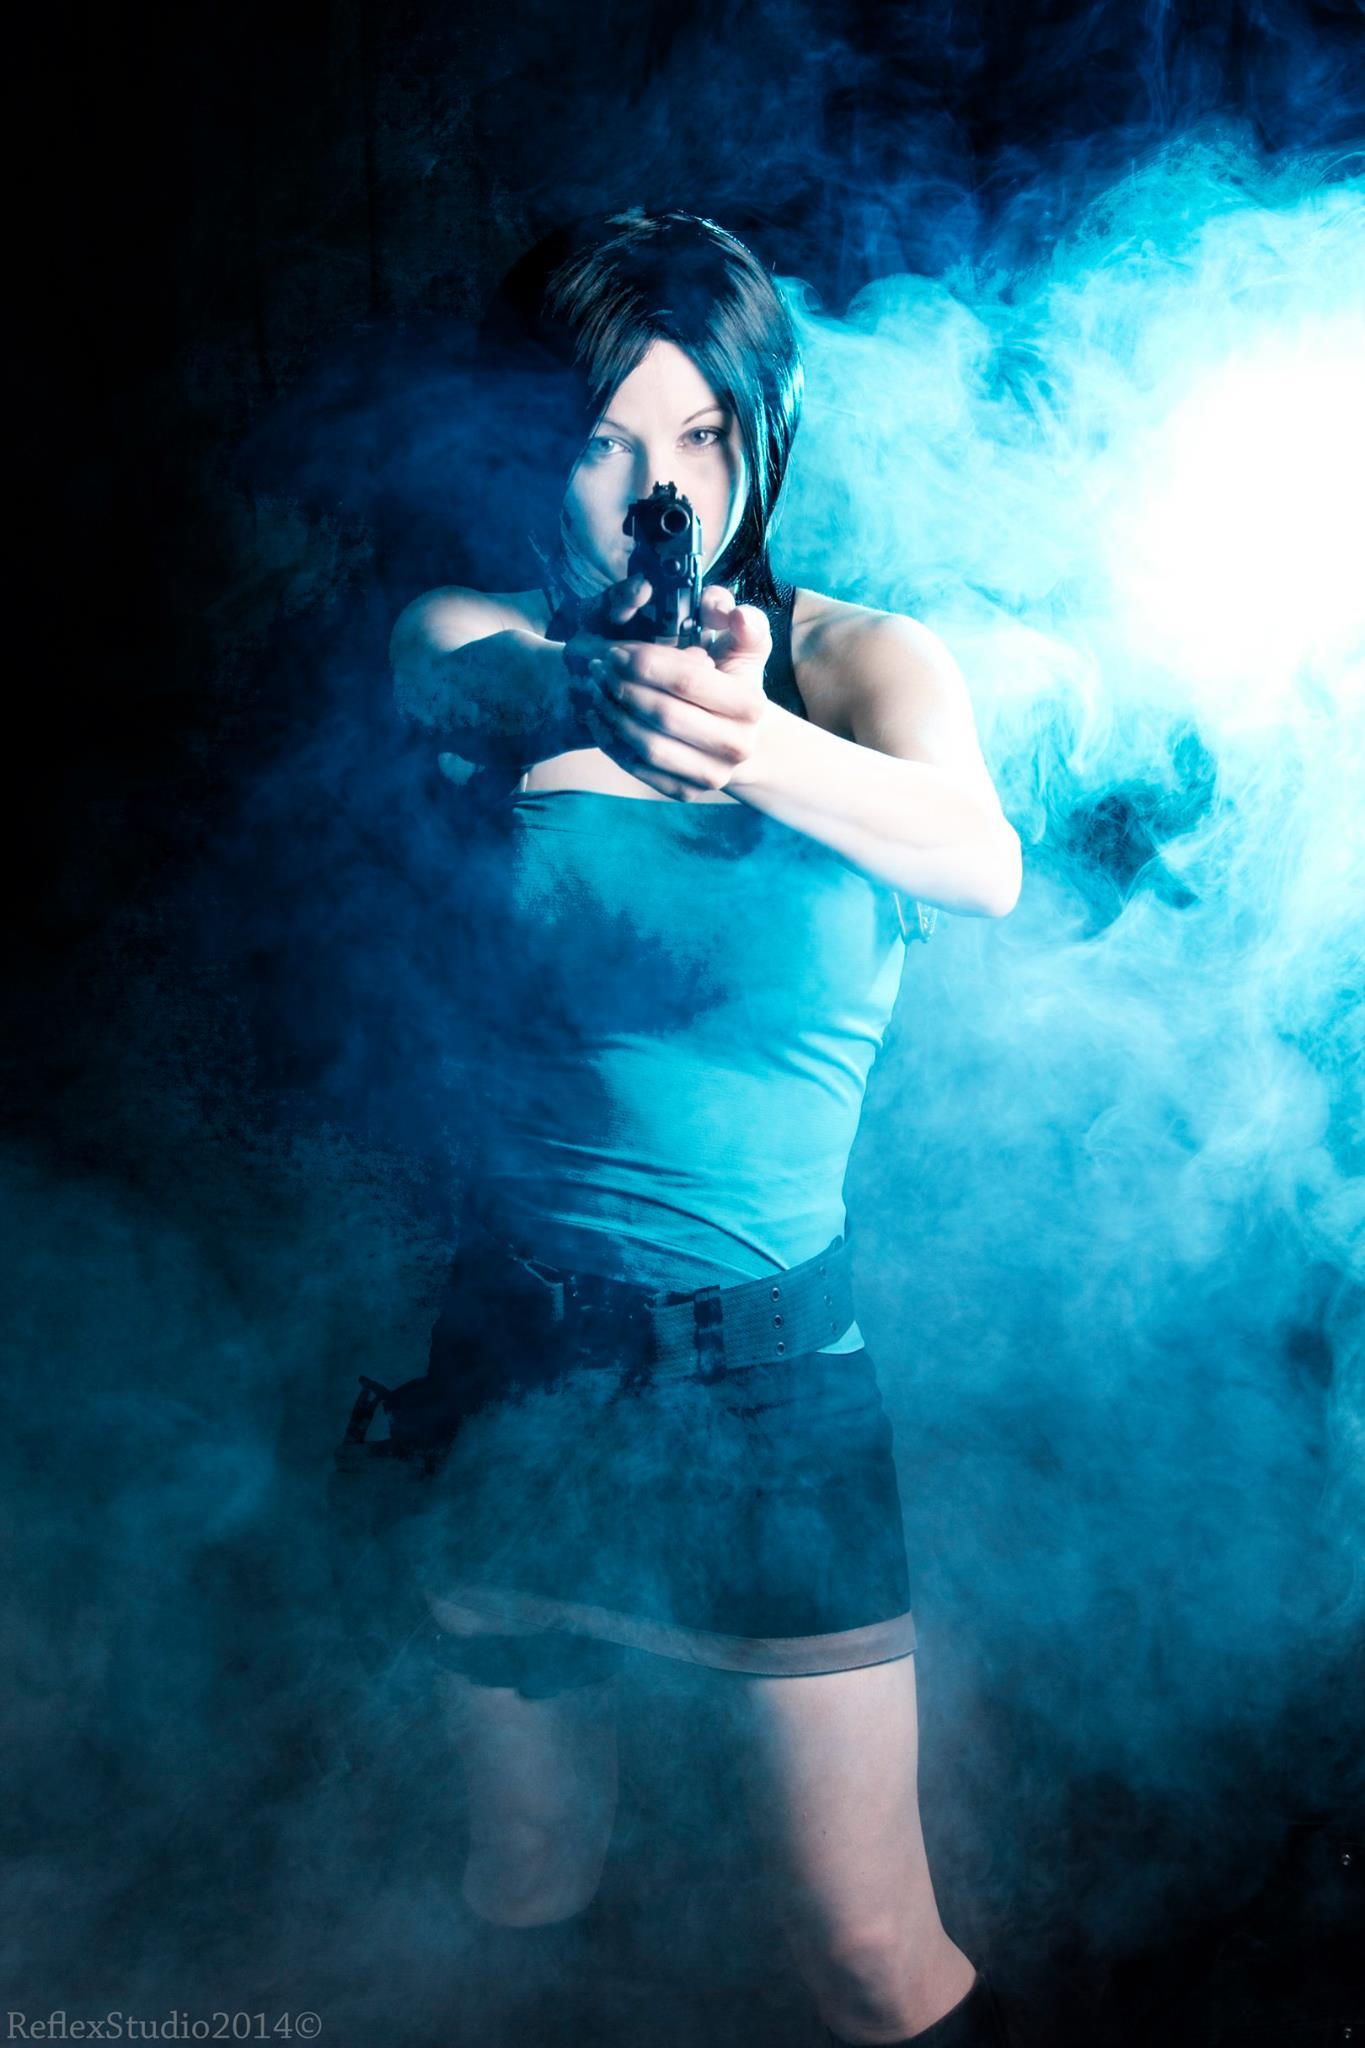 Resident Evil 7 - Jill Valentine